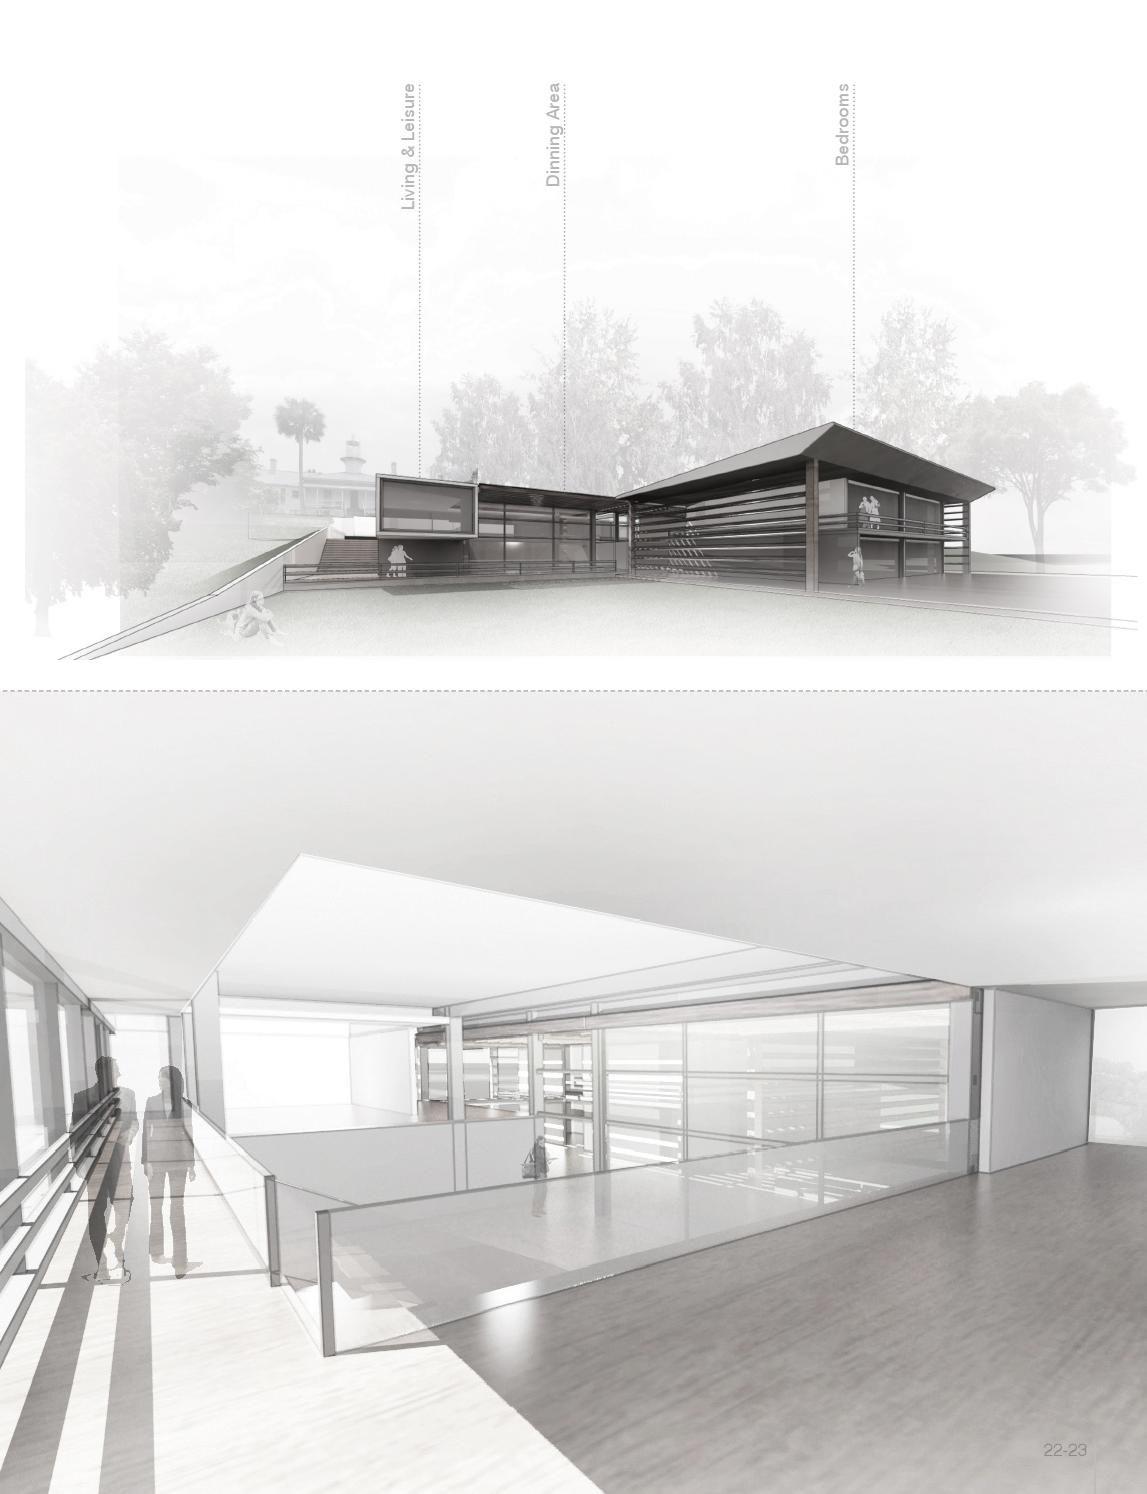 architecture portfolio vongvanij issuu architecture portfolio